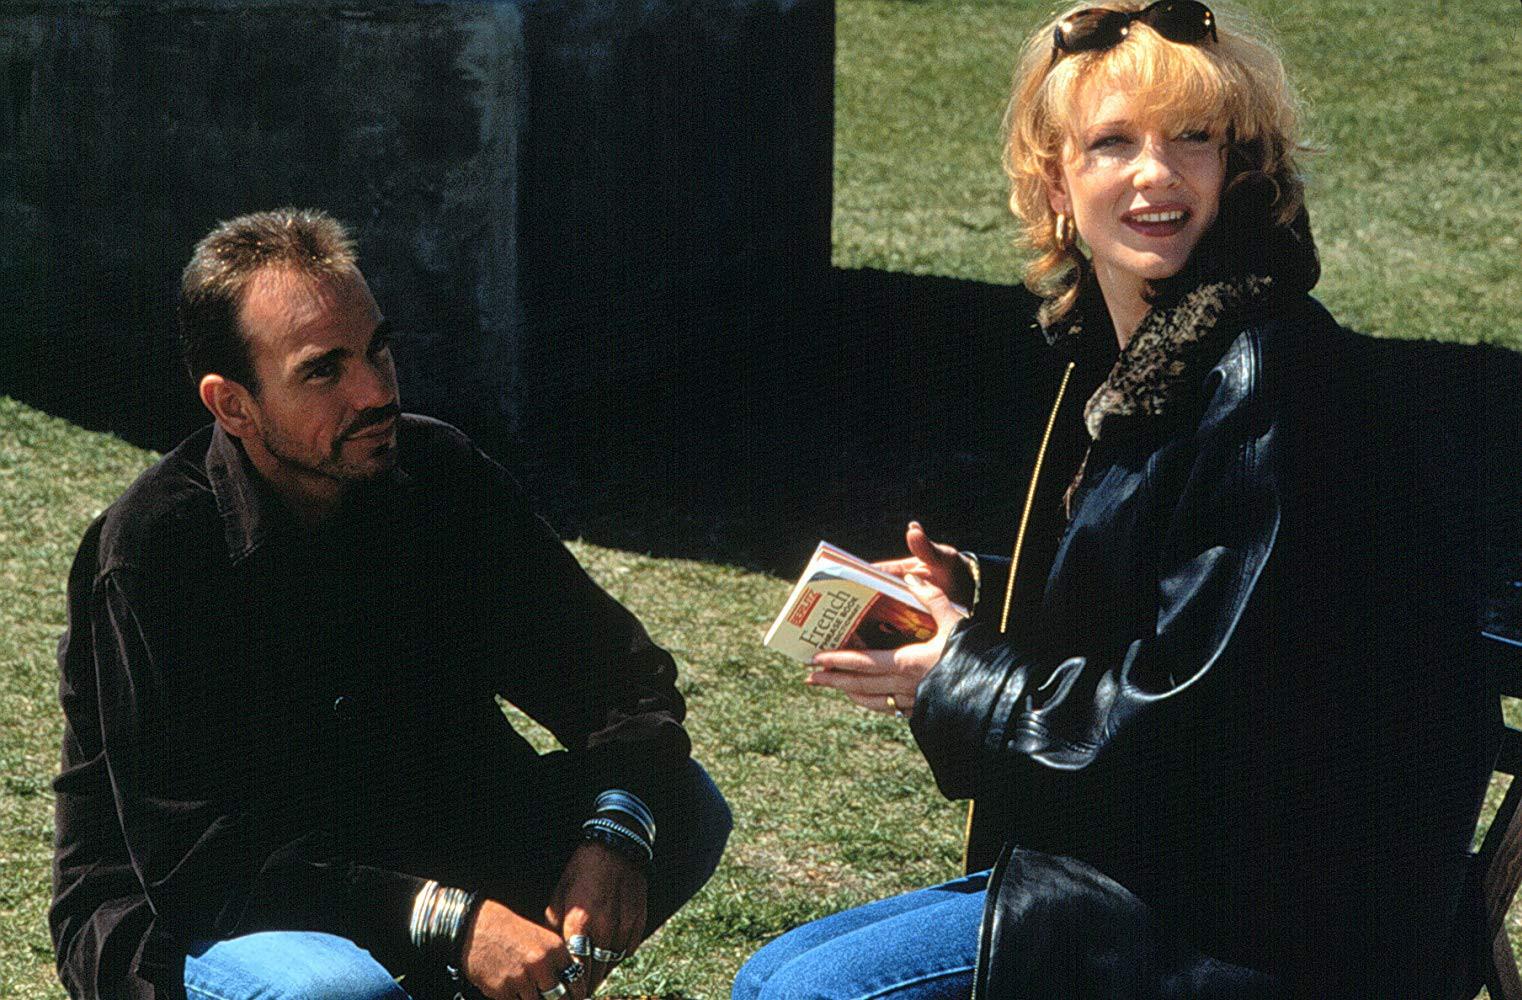 Billy Bob Thornton and Cate Blanchett